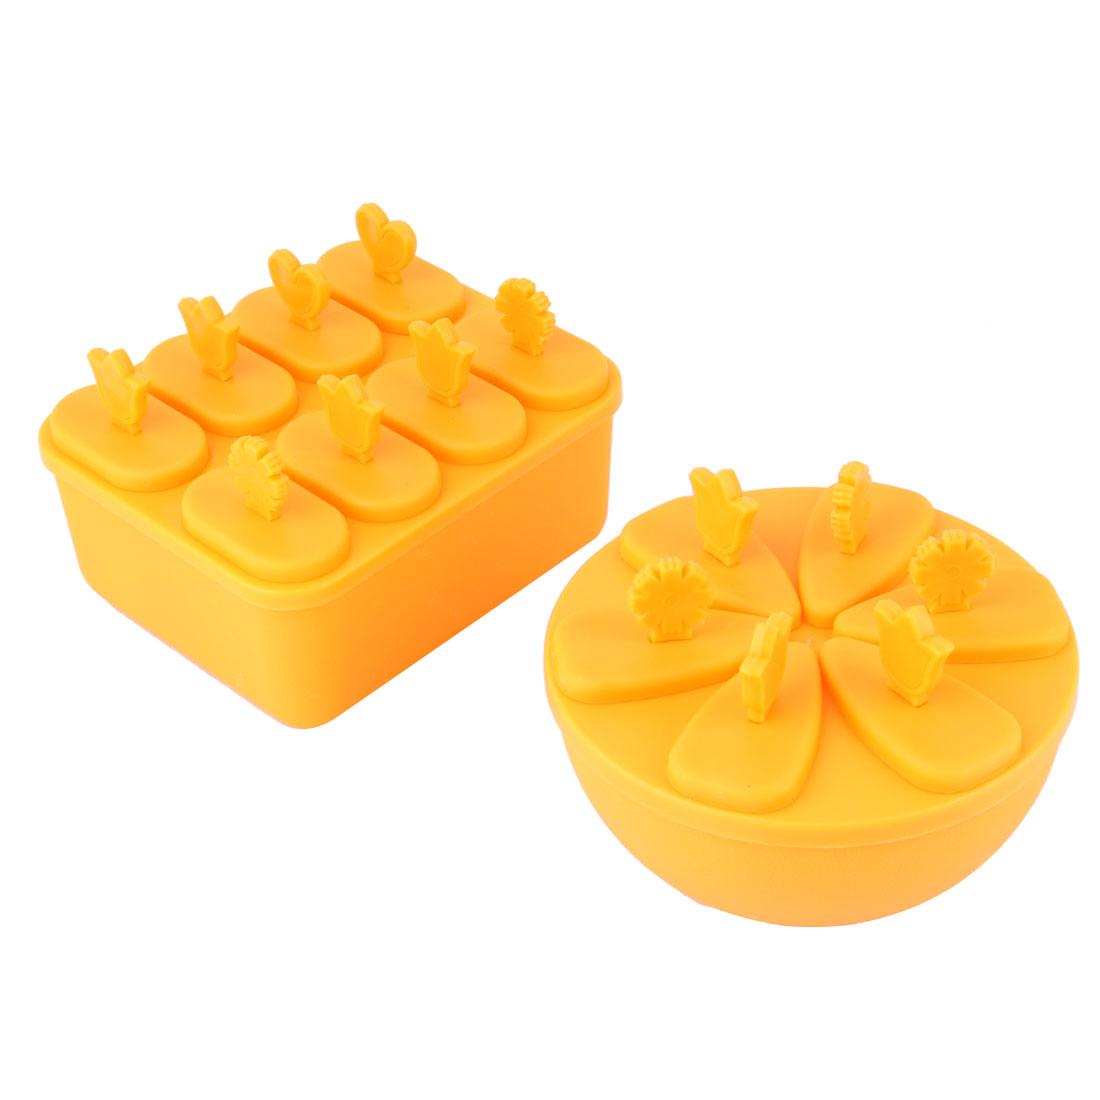 Household Home Kitchen DIY Refrigerator Plastic Ice Cream Mold Orange 2 in 1